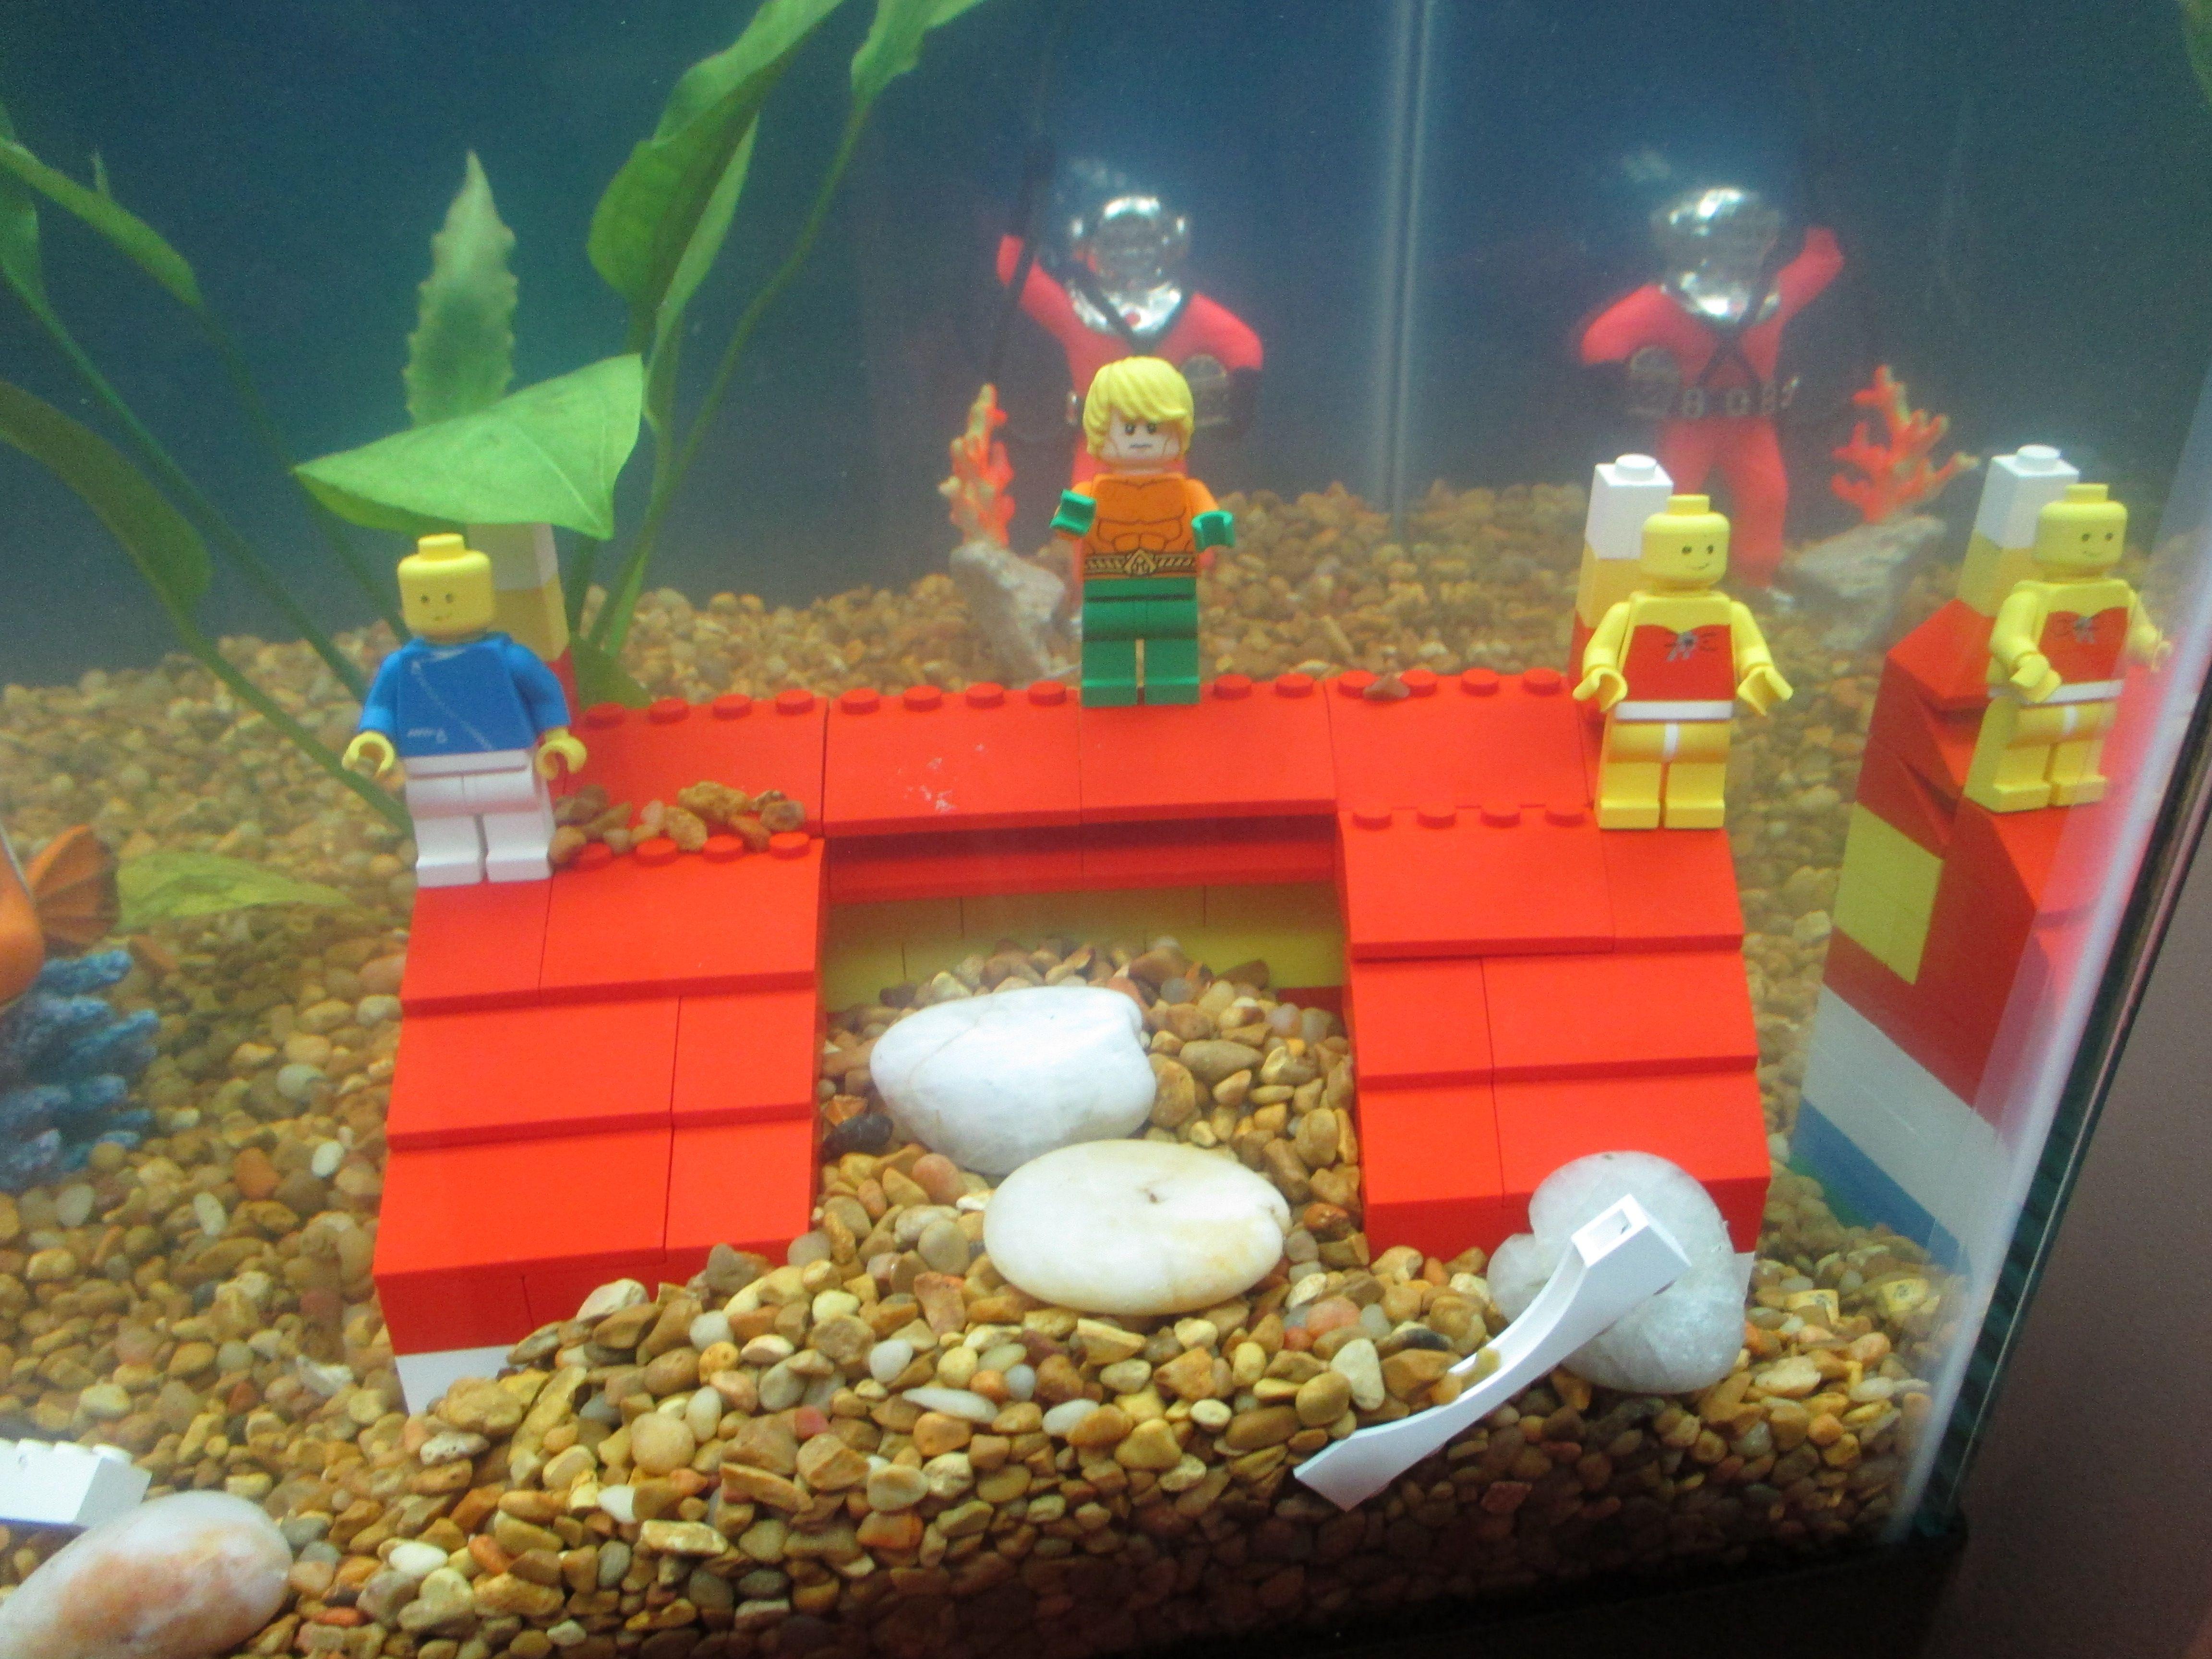 Fish Tank Has Lego House With Aquaman To Celebrate Lego